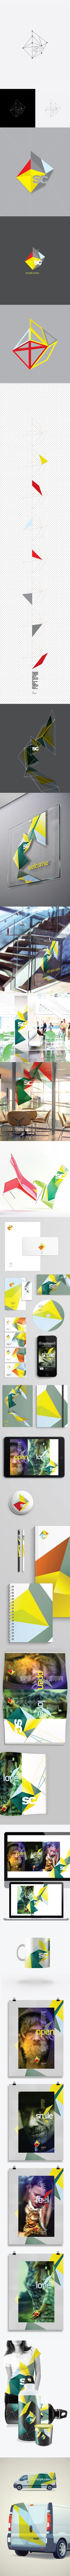 Simple Colors by Graphic Man, via Behance